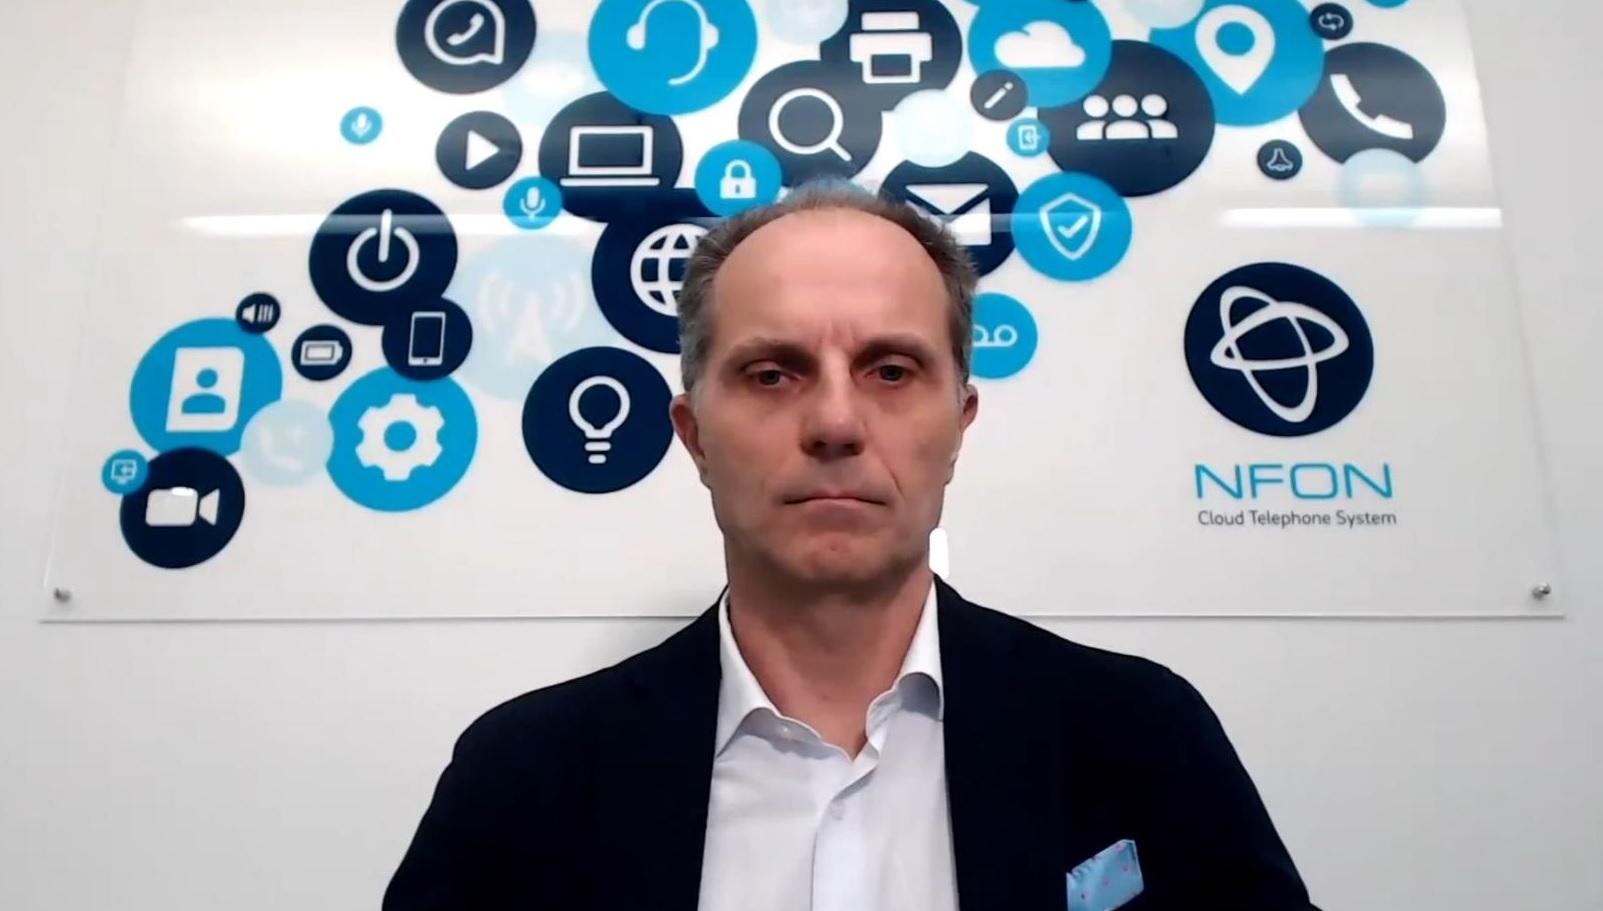 Marco Pasculli, managing director di Nfon Italia